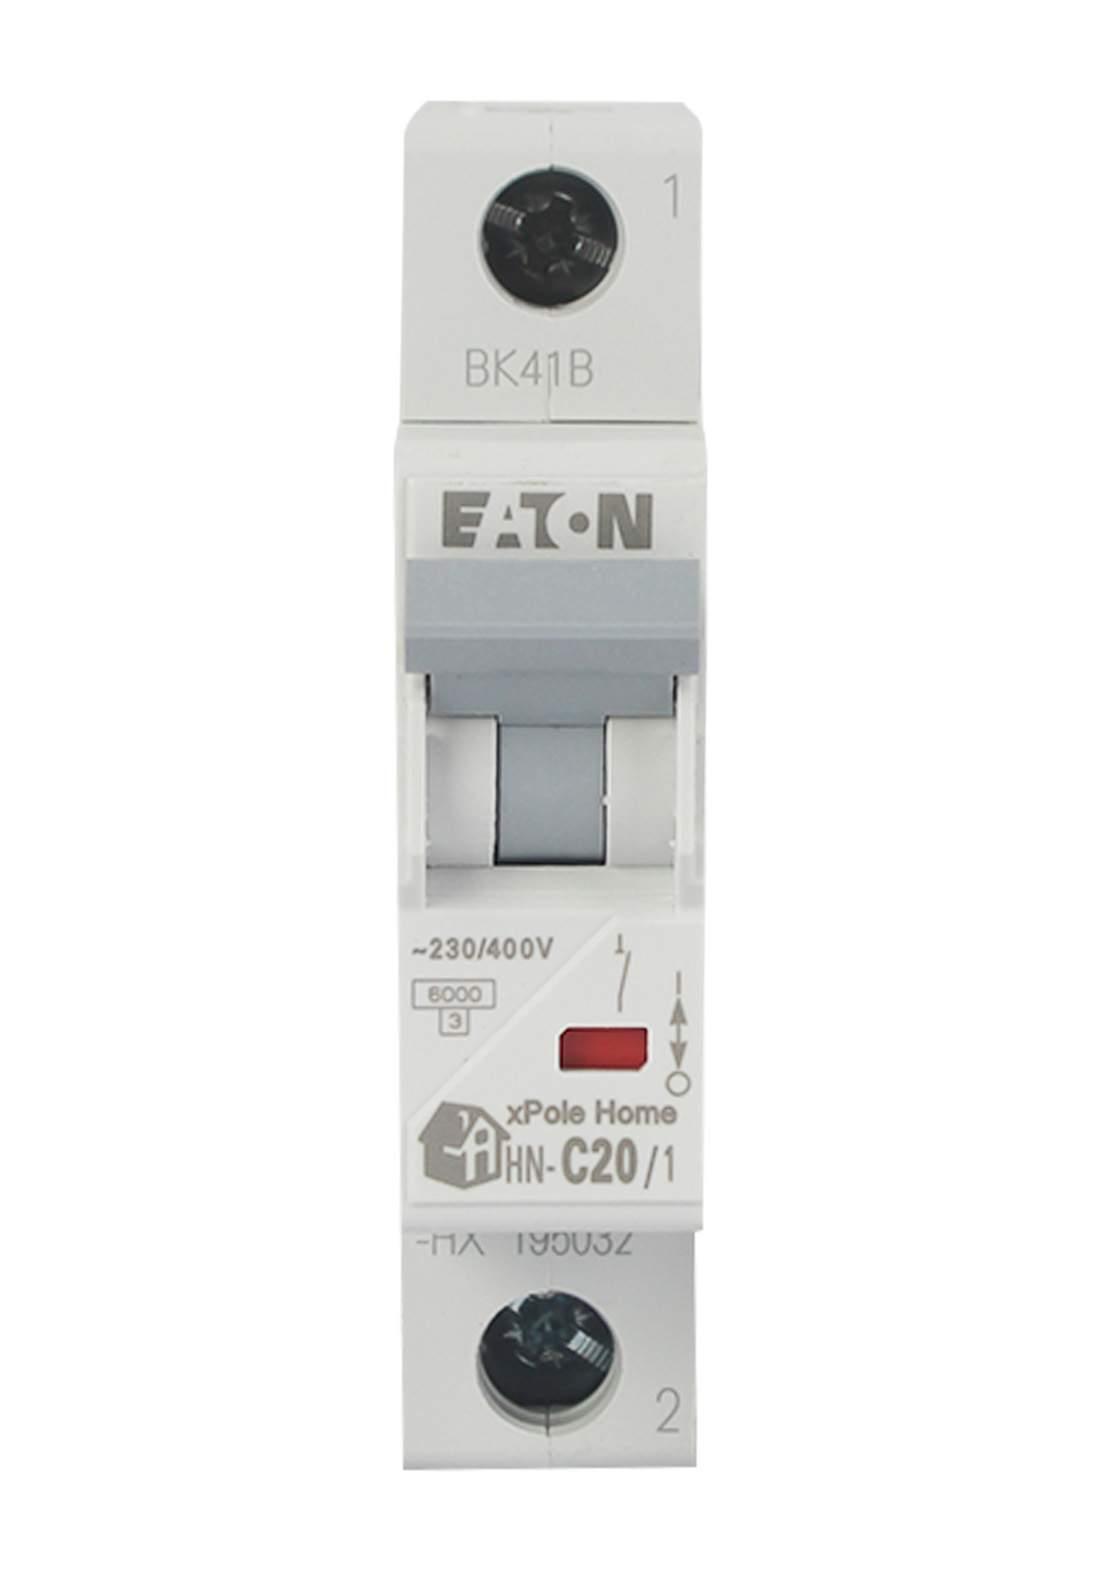 Eaton HN-C20/1-HX Circuit Breaker 20A قاطع تيار الكهرباء (جوزة)